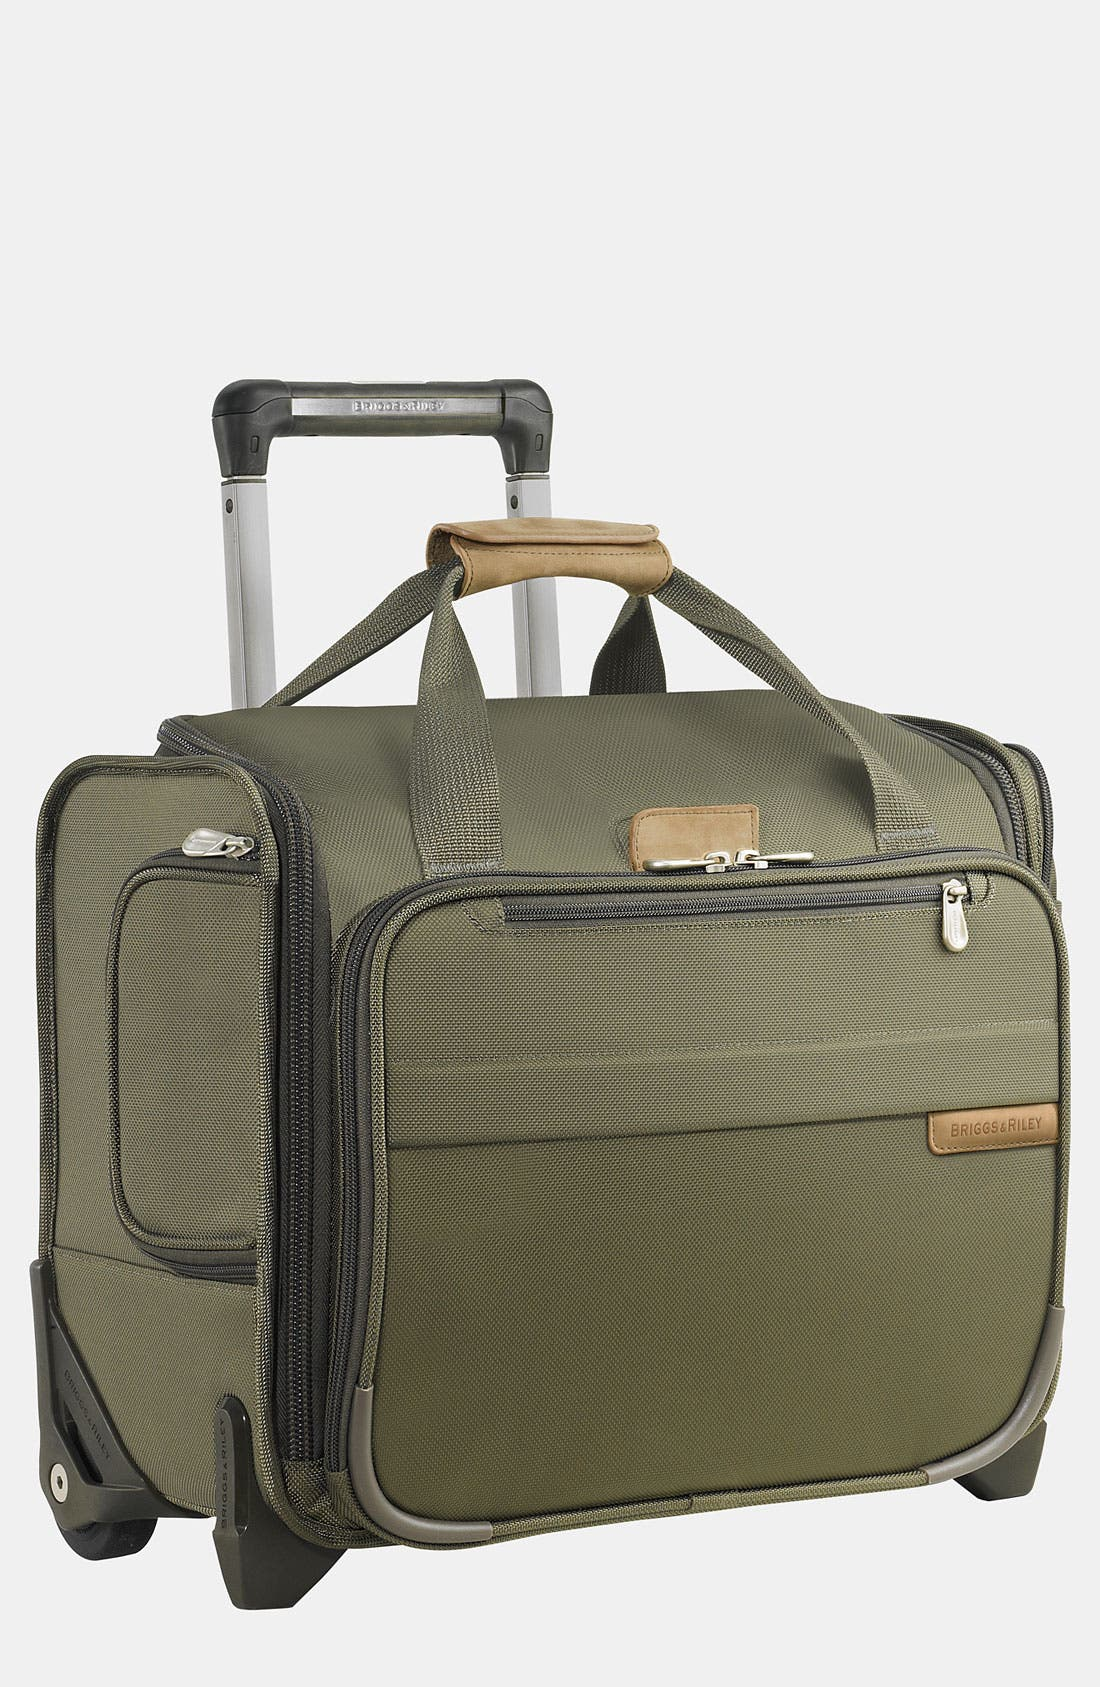 Baseline 16-Inch Rolling Cabin Bag